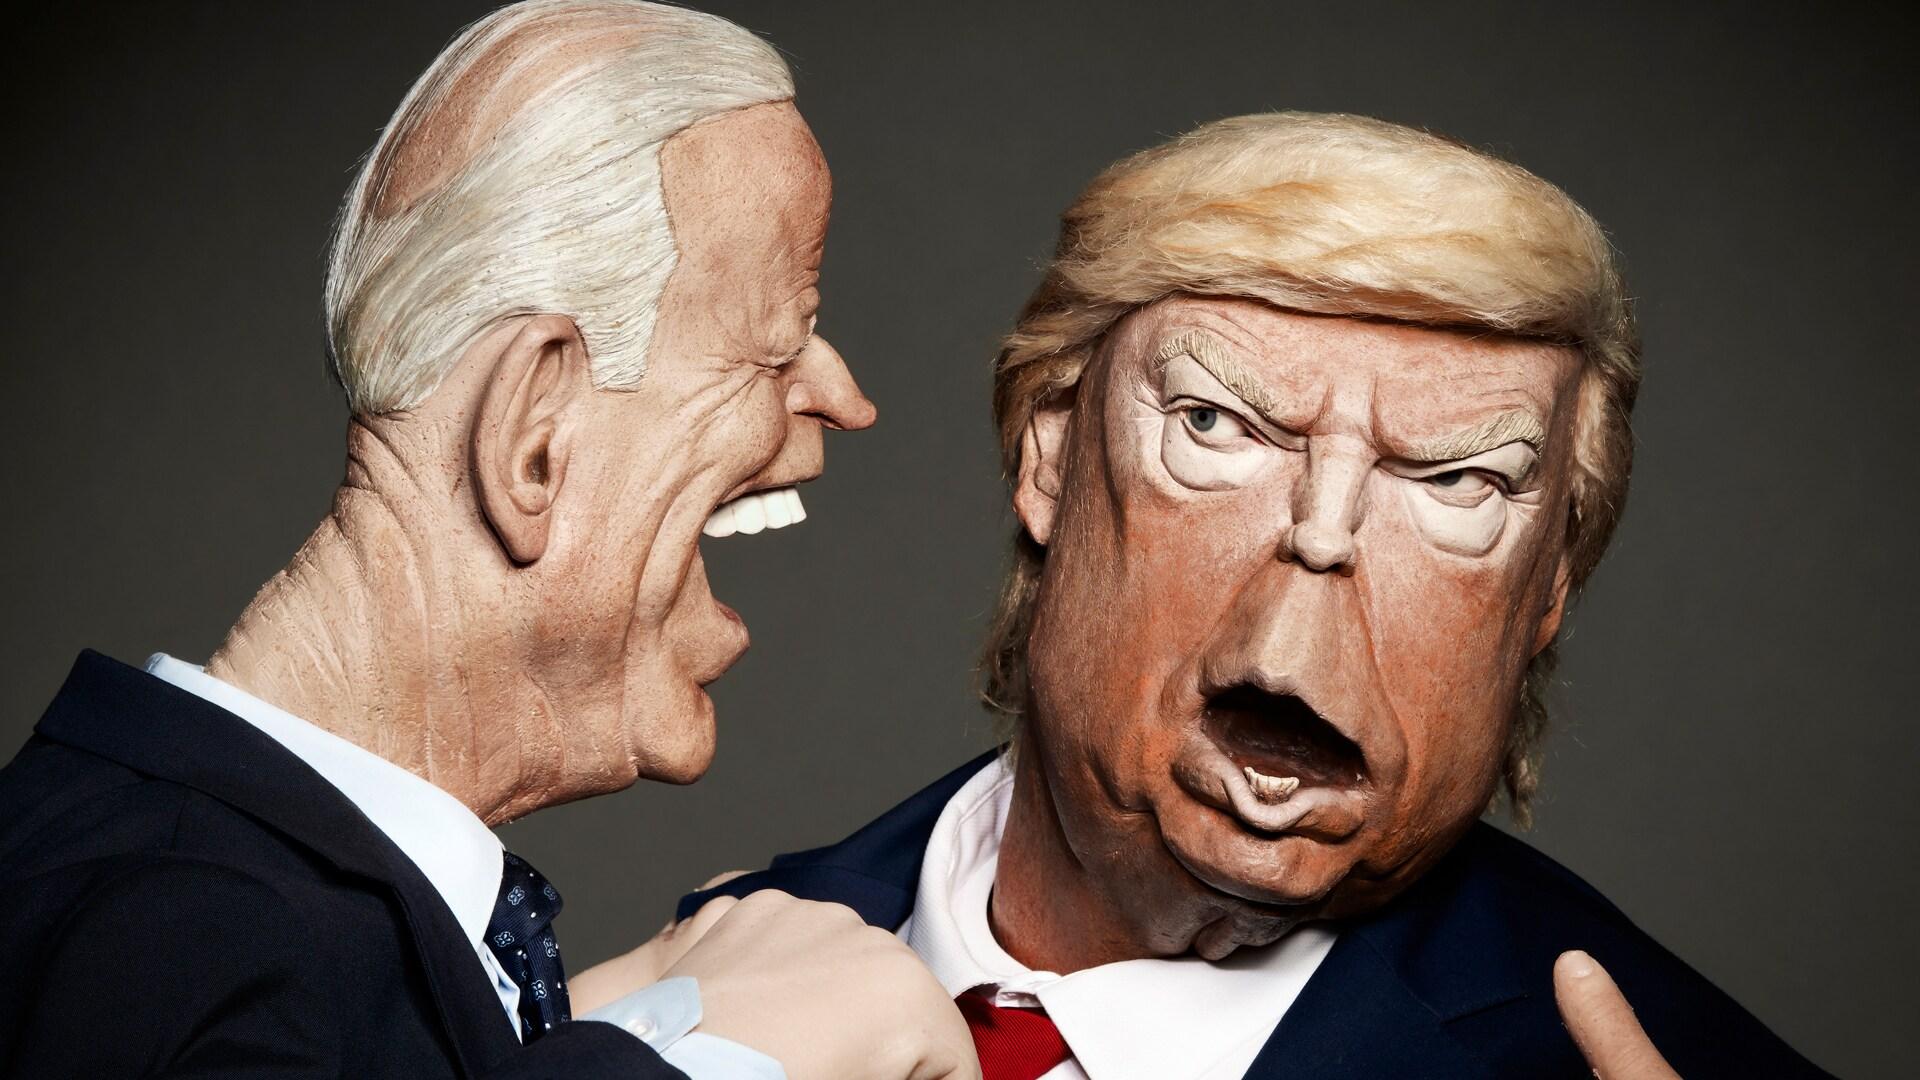 U.S. Election Special Part 2